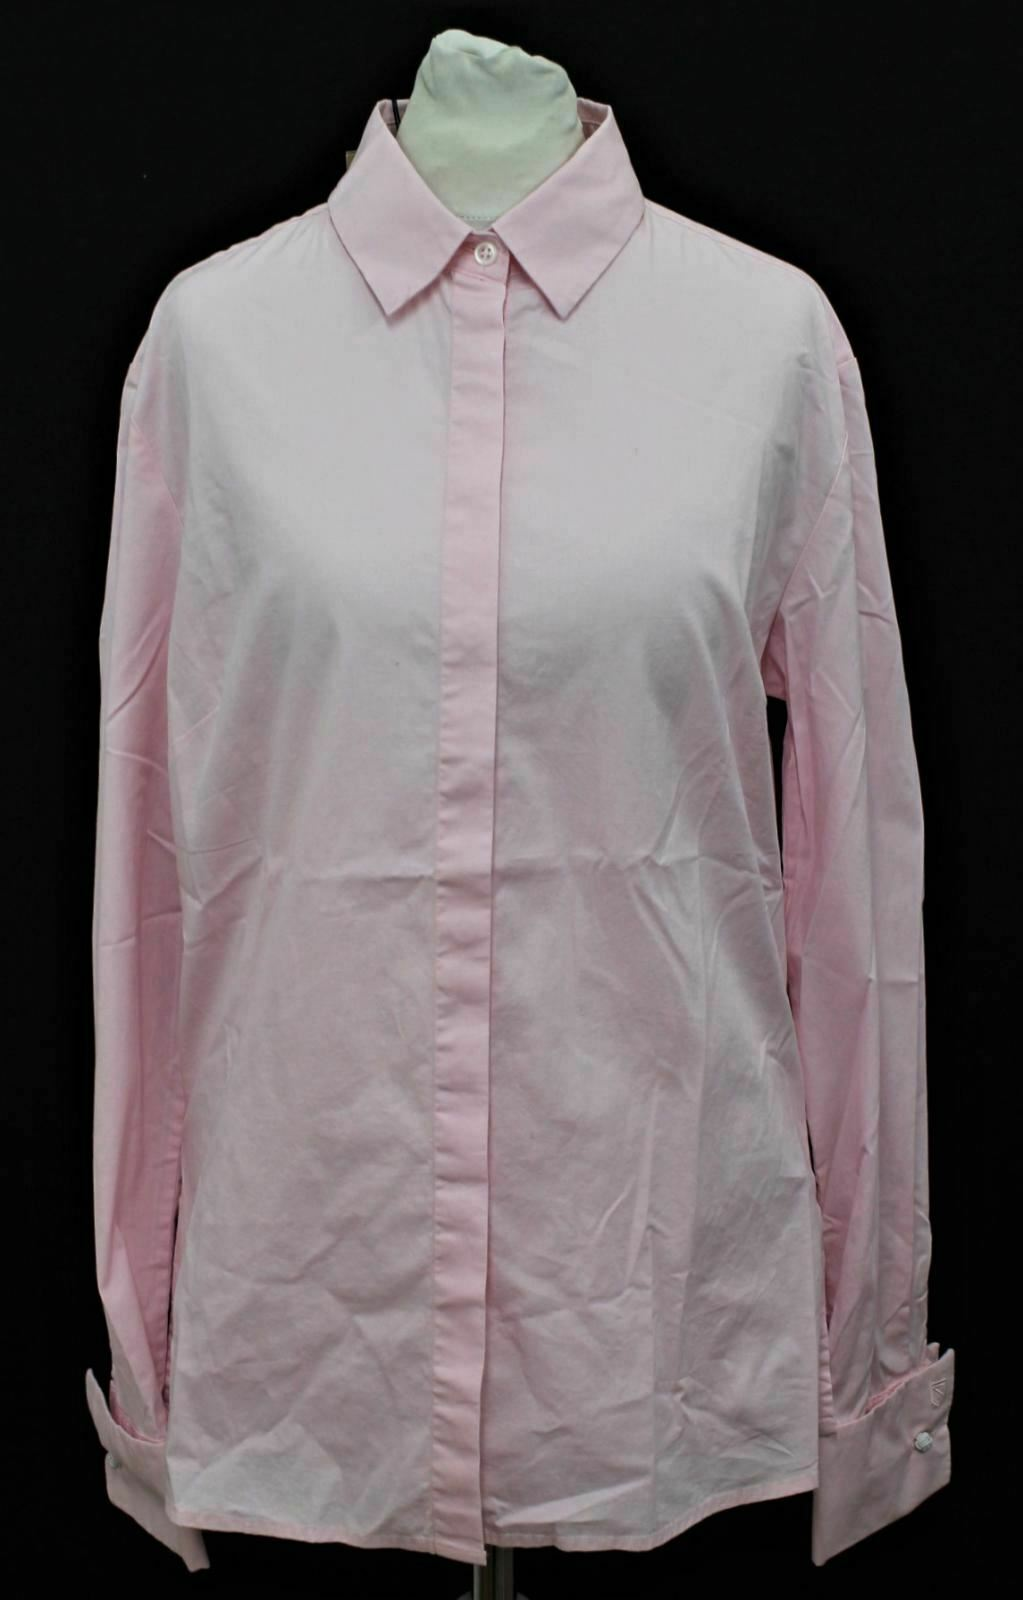 BNWT DUBARRY Ladies Daffodil Pale Rosa Stretch Cotton Blouse Shirt UK12 EU38